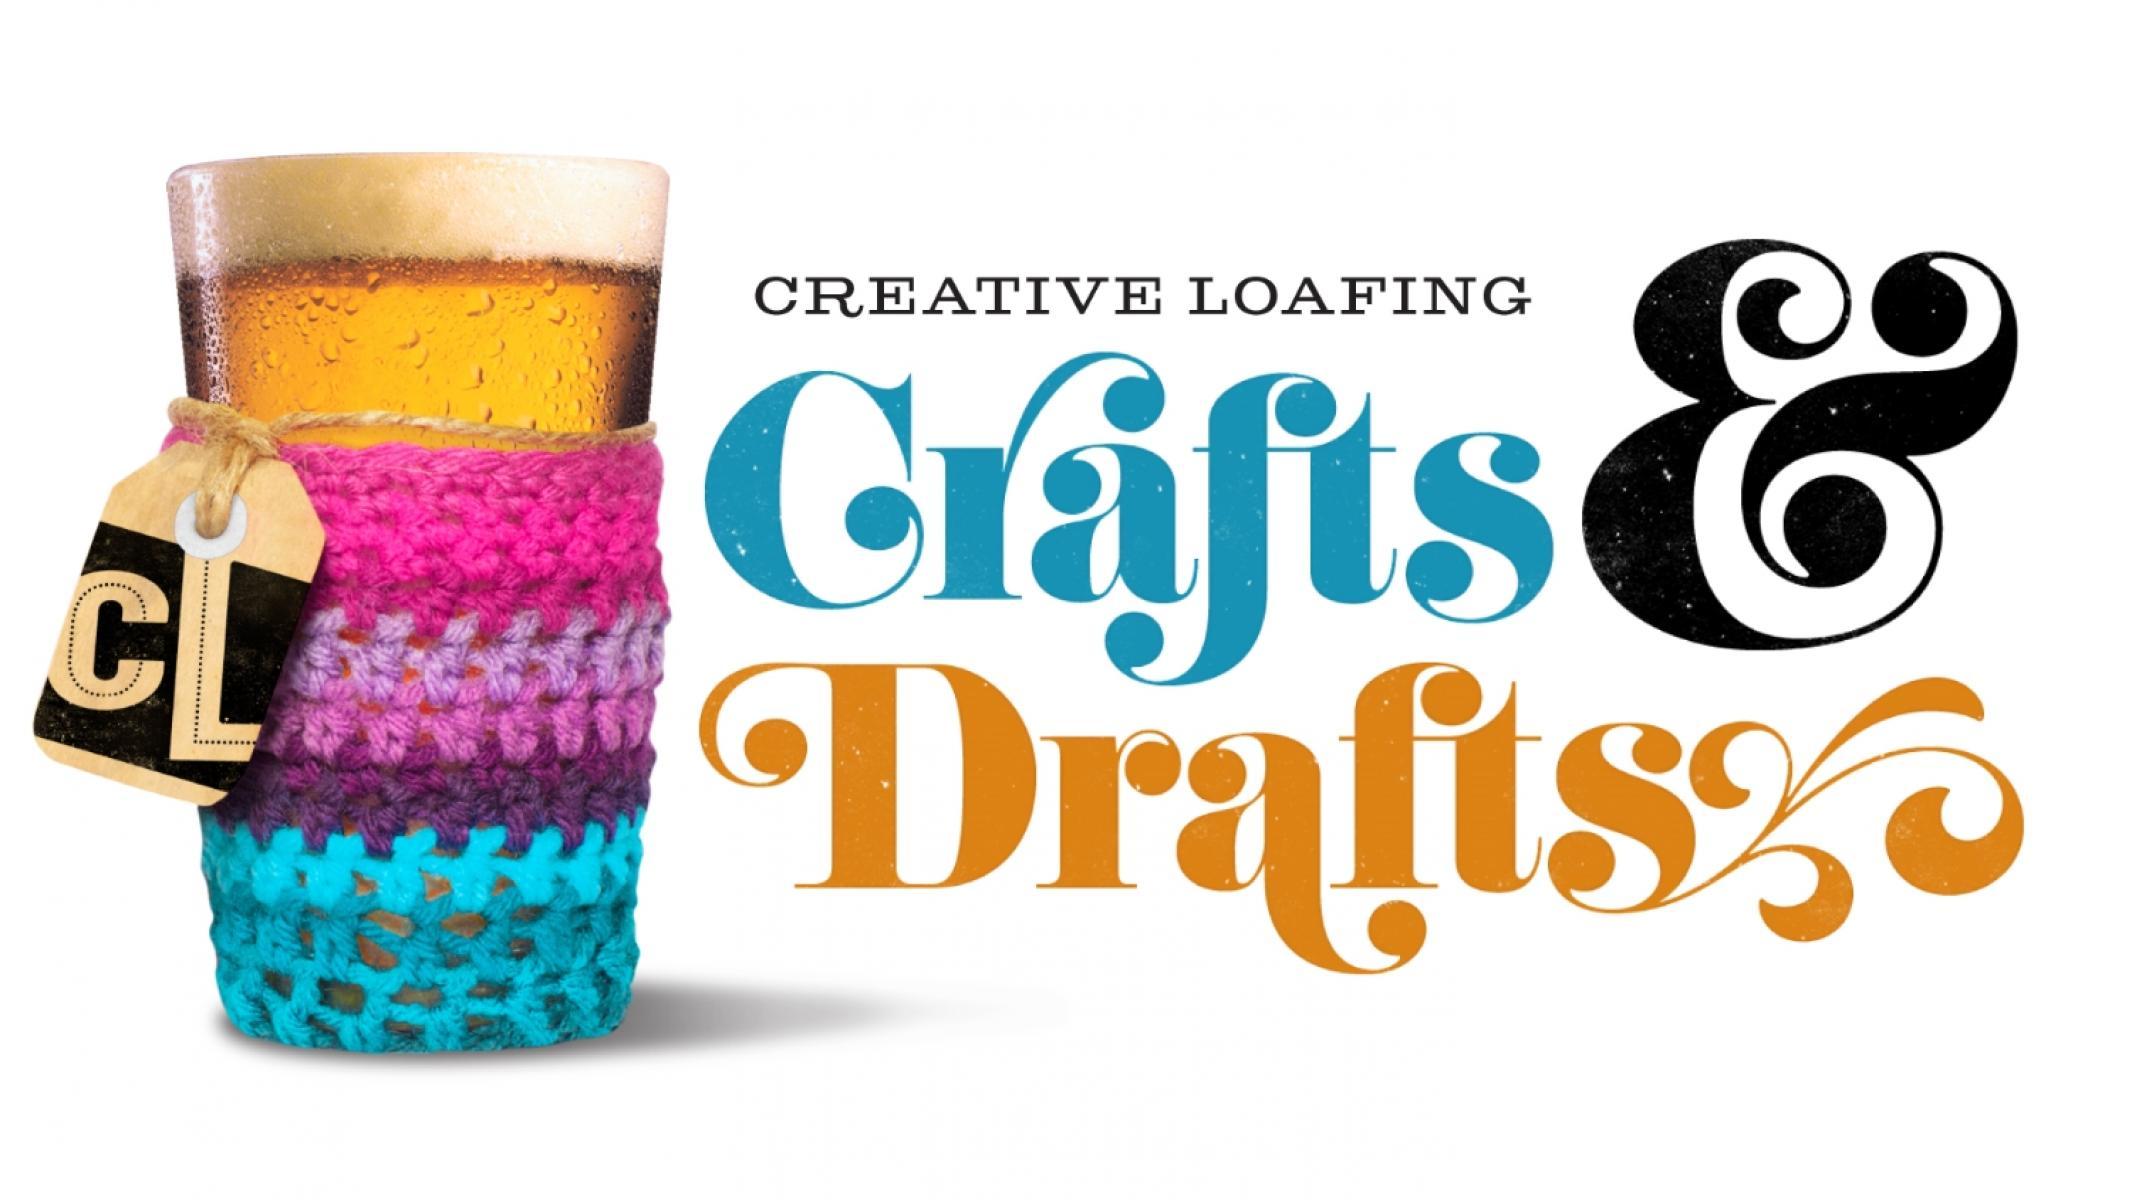 Creative Loafings Crafts Amp Drafts Tampa FL Nov 4 2017